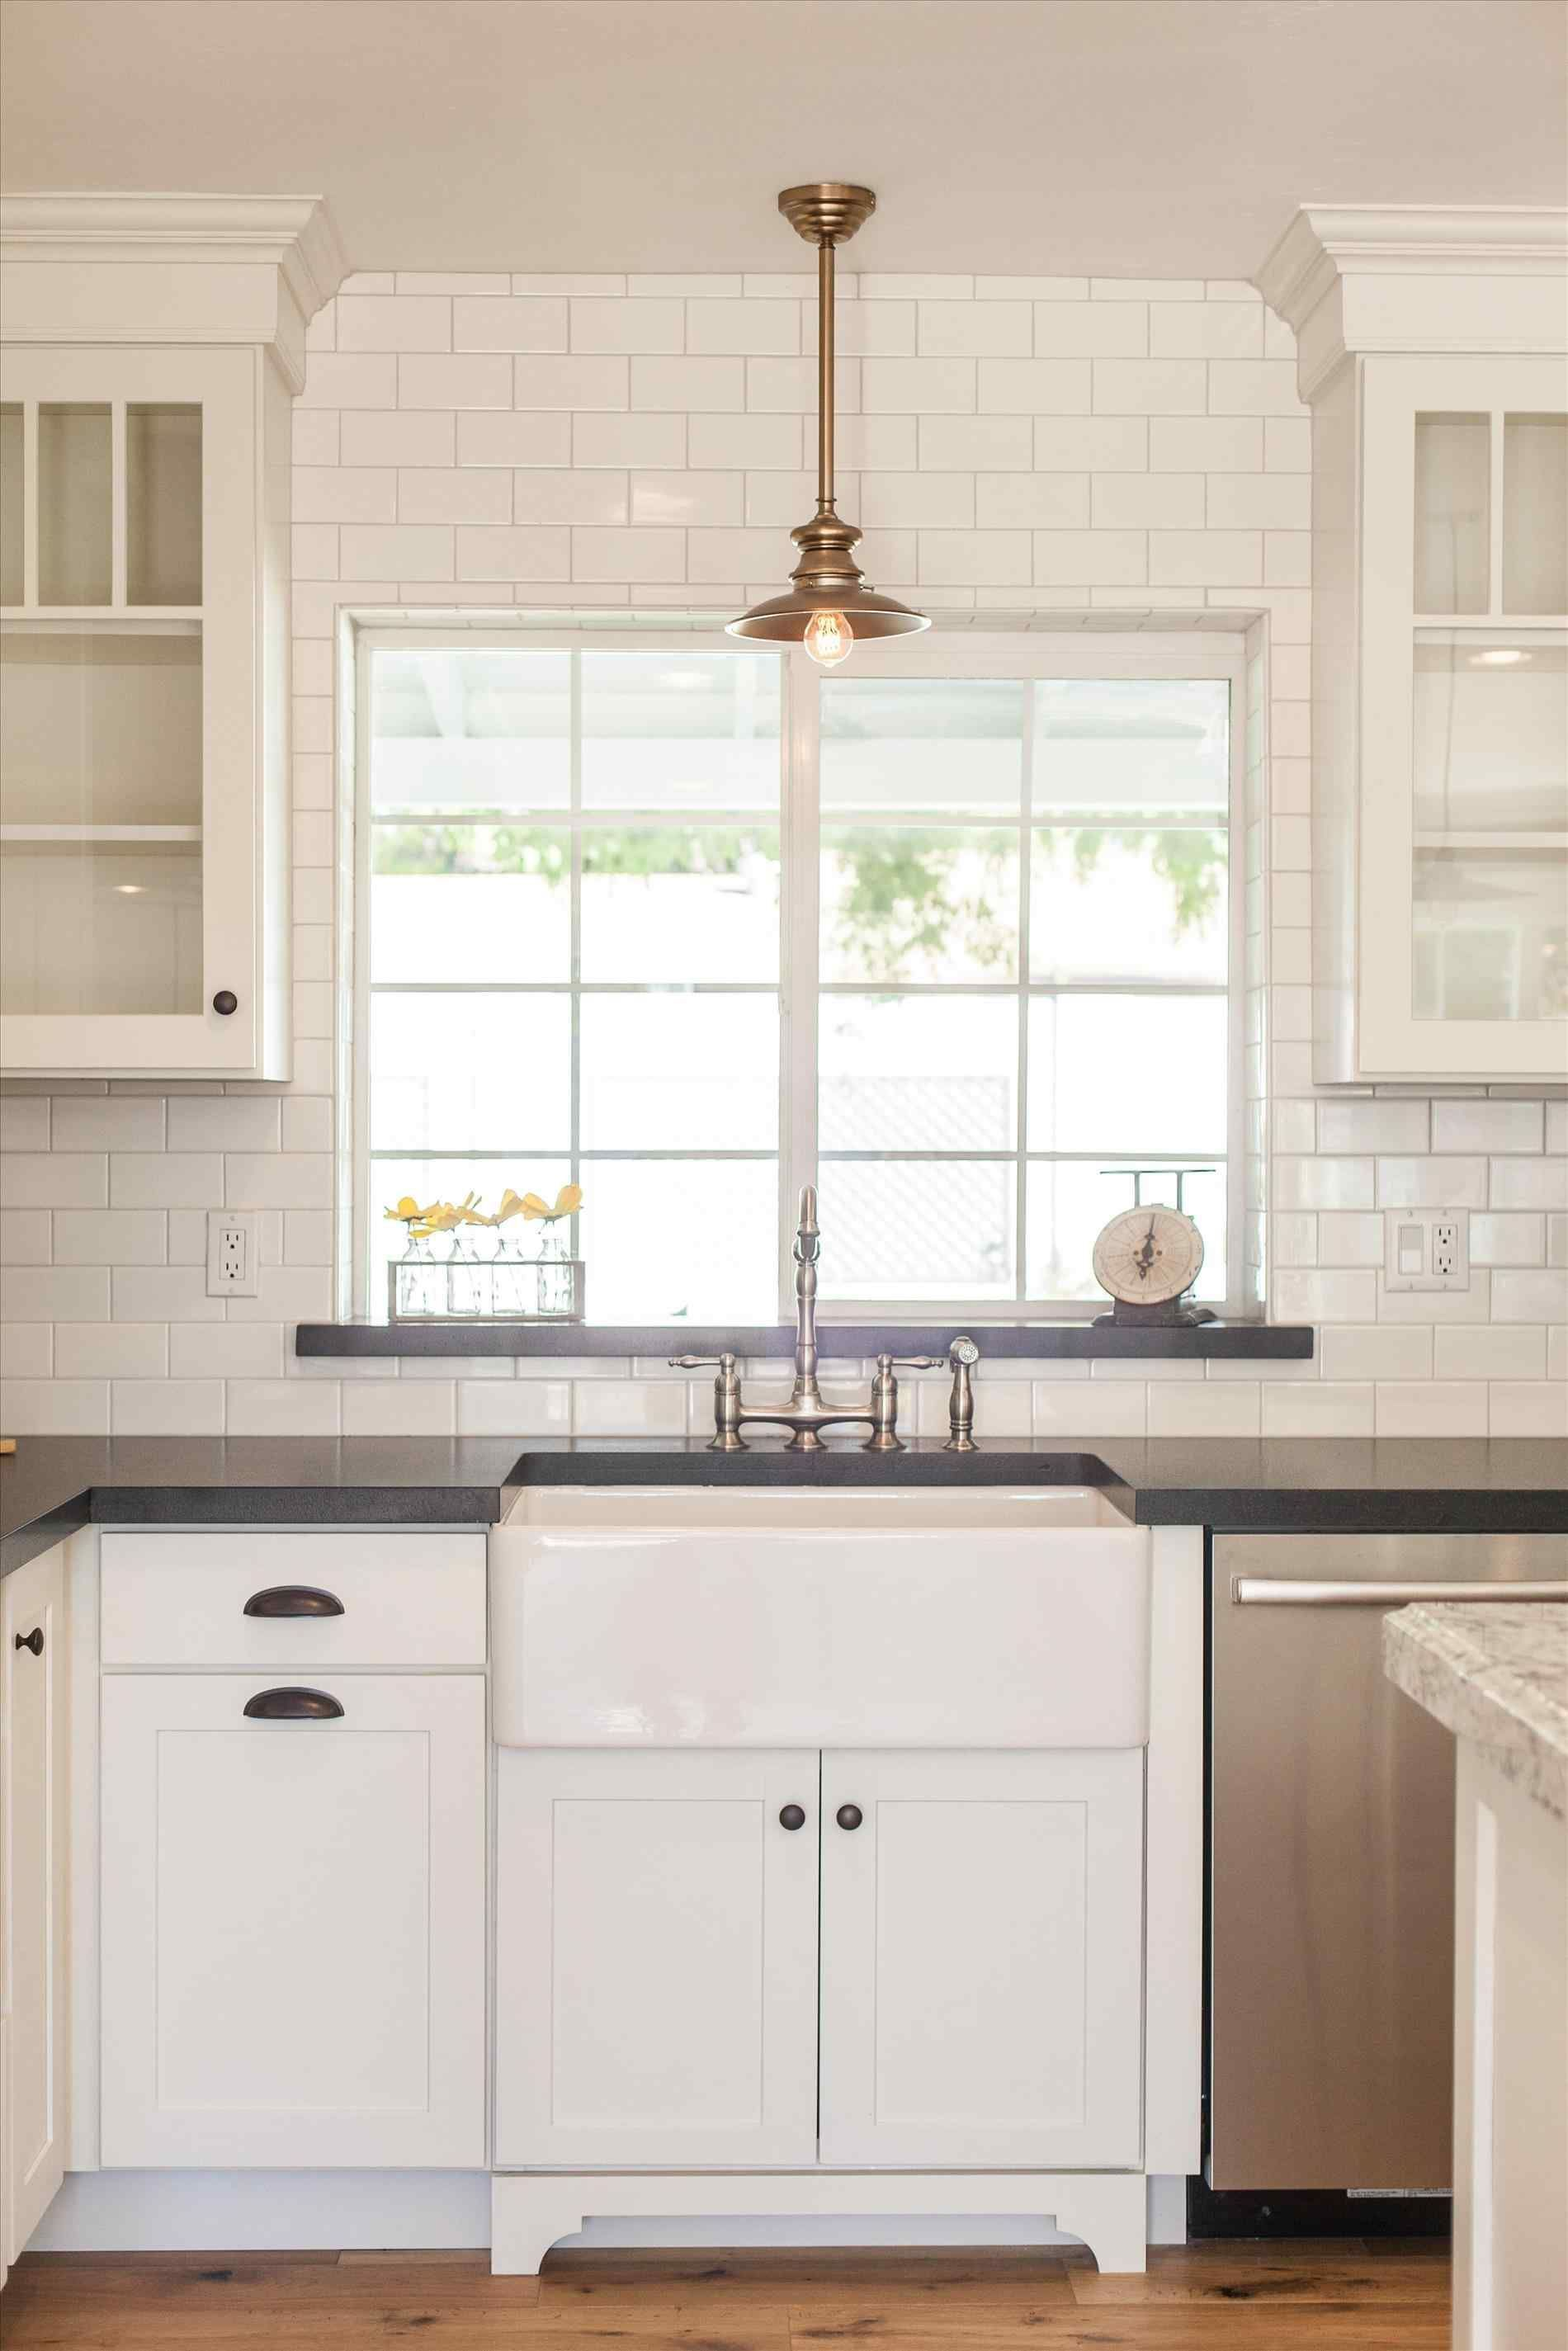 34 Enchanting Metro Tiles Photo Small Kitchen Backsplash